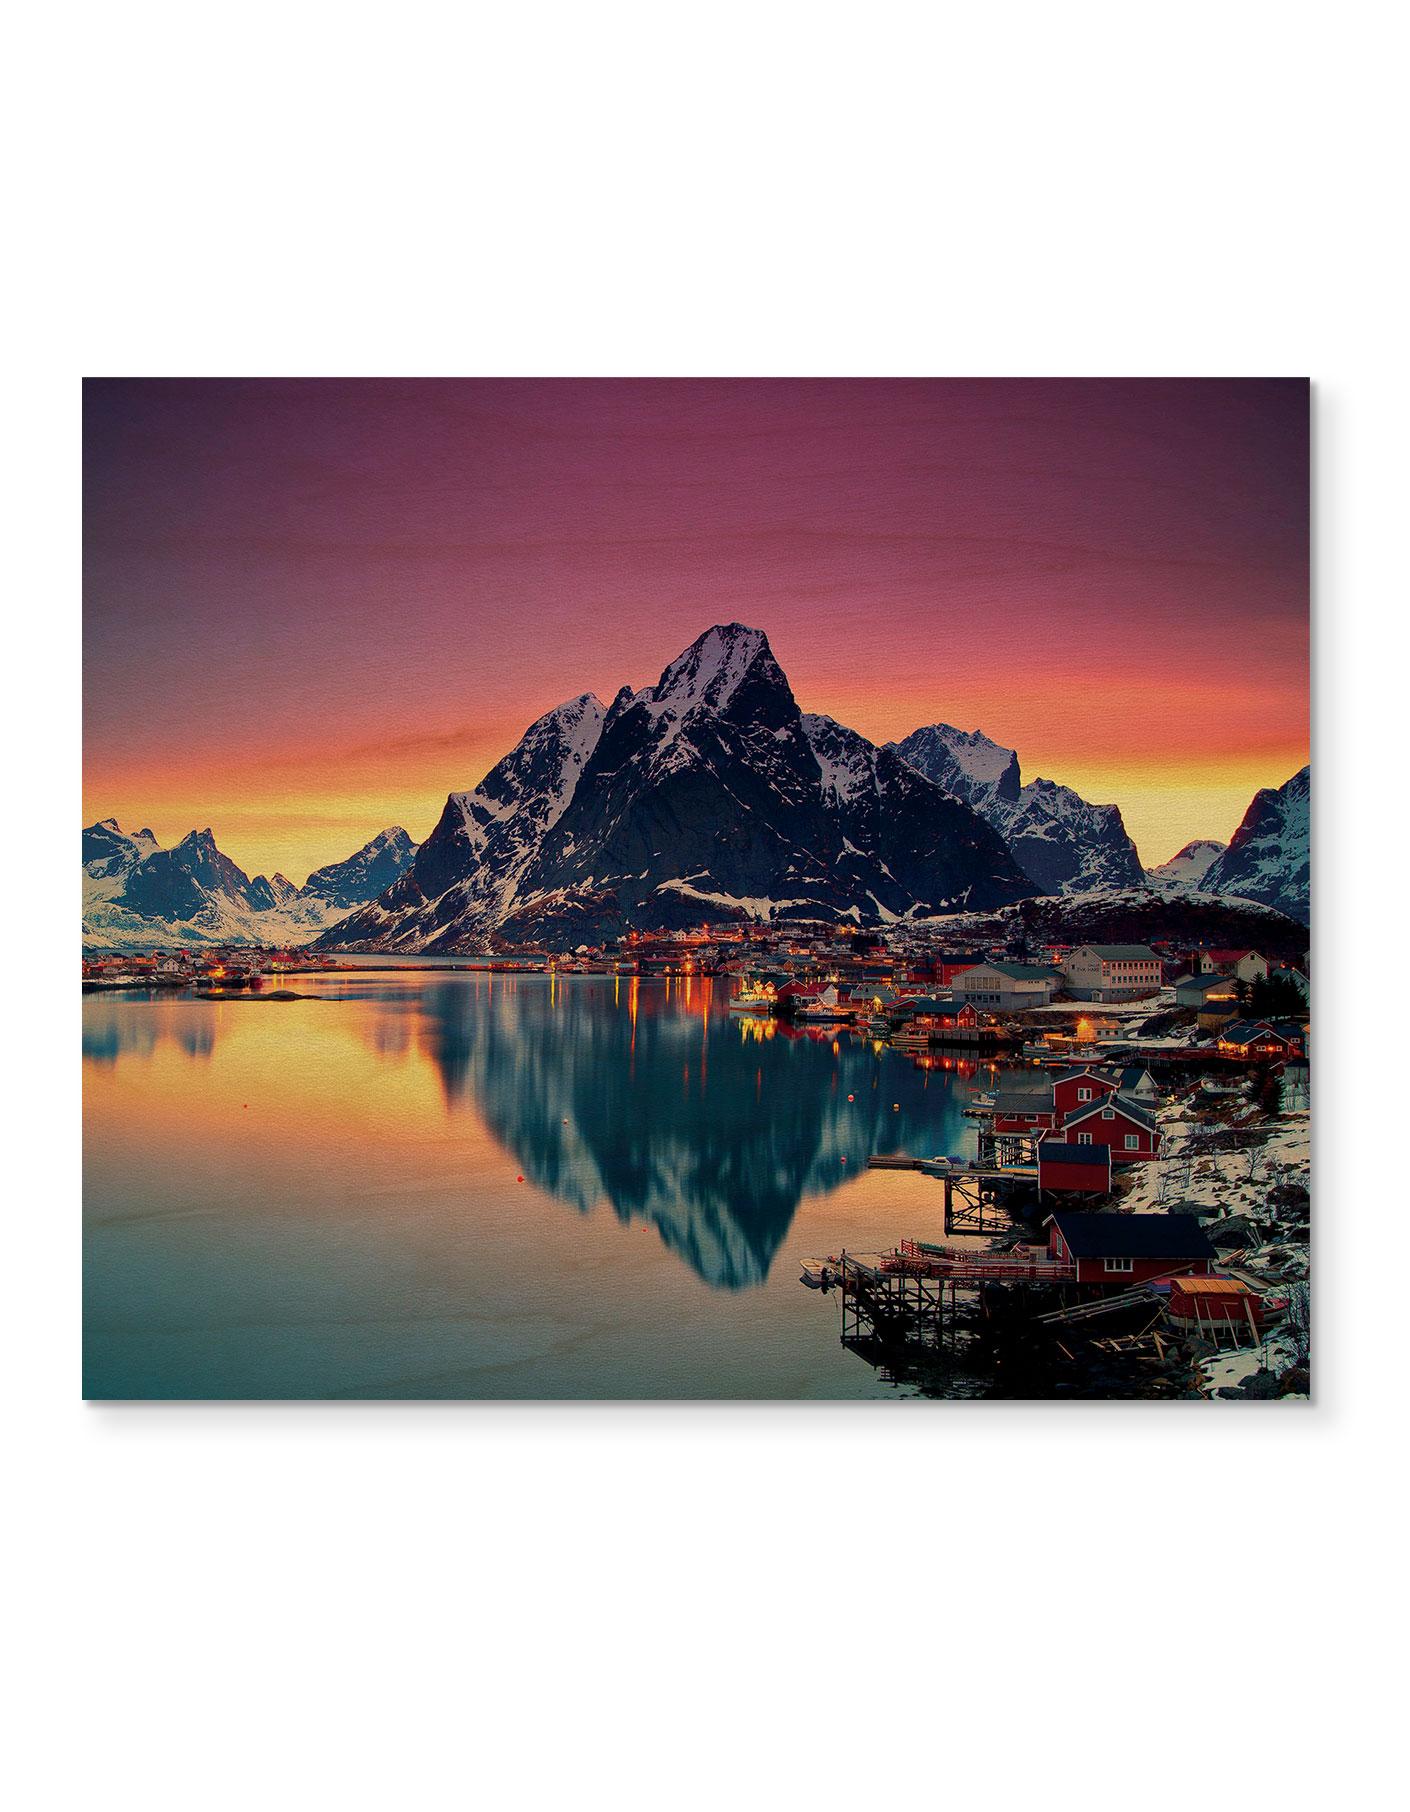 Photos Printed on Wood